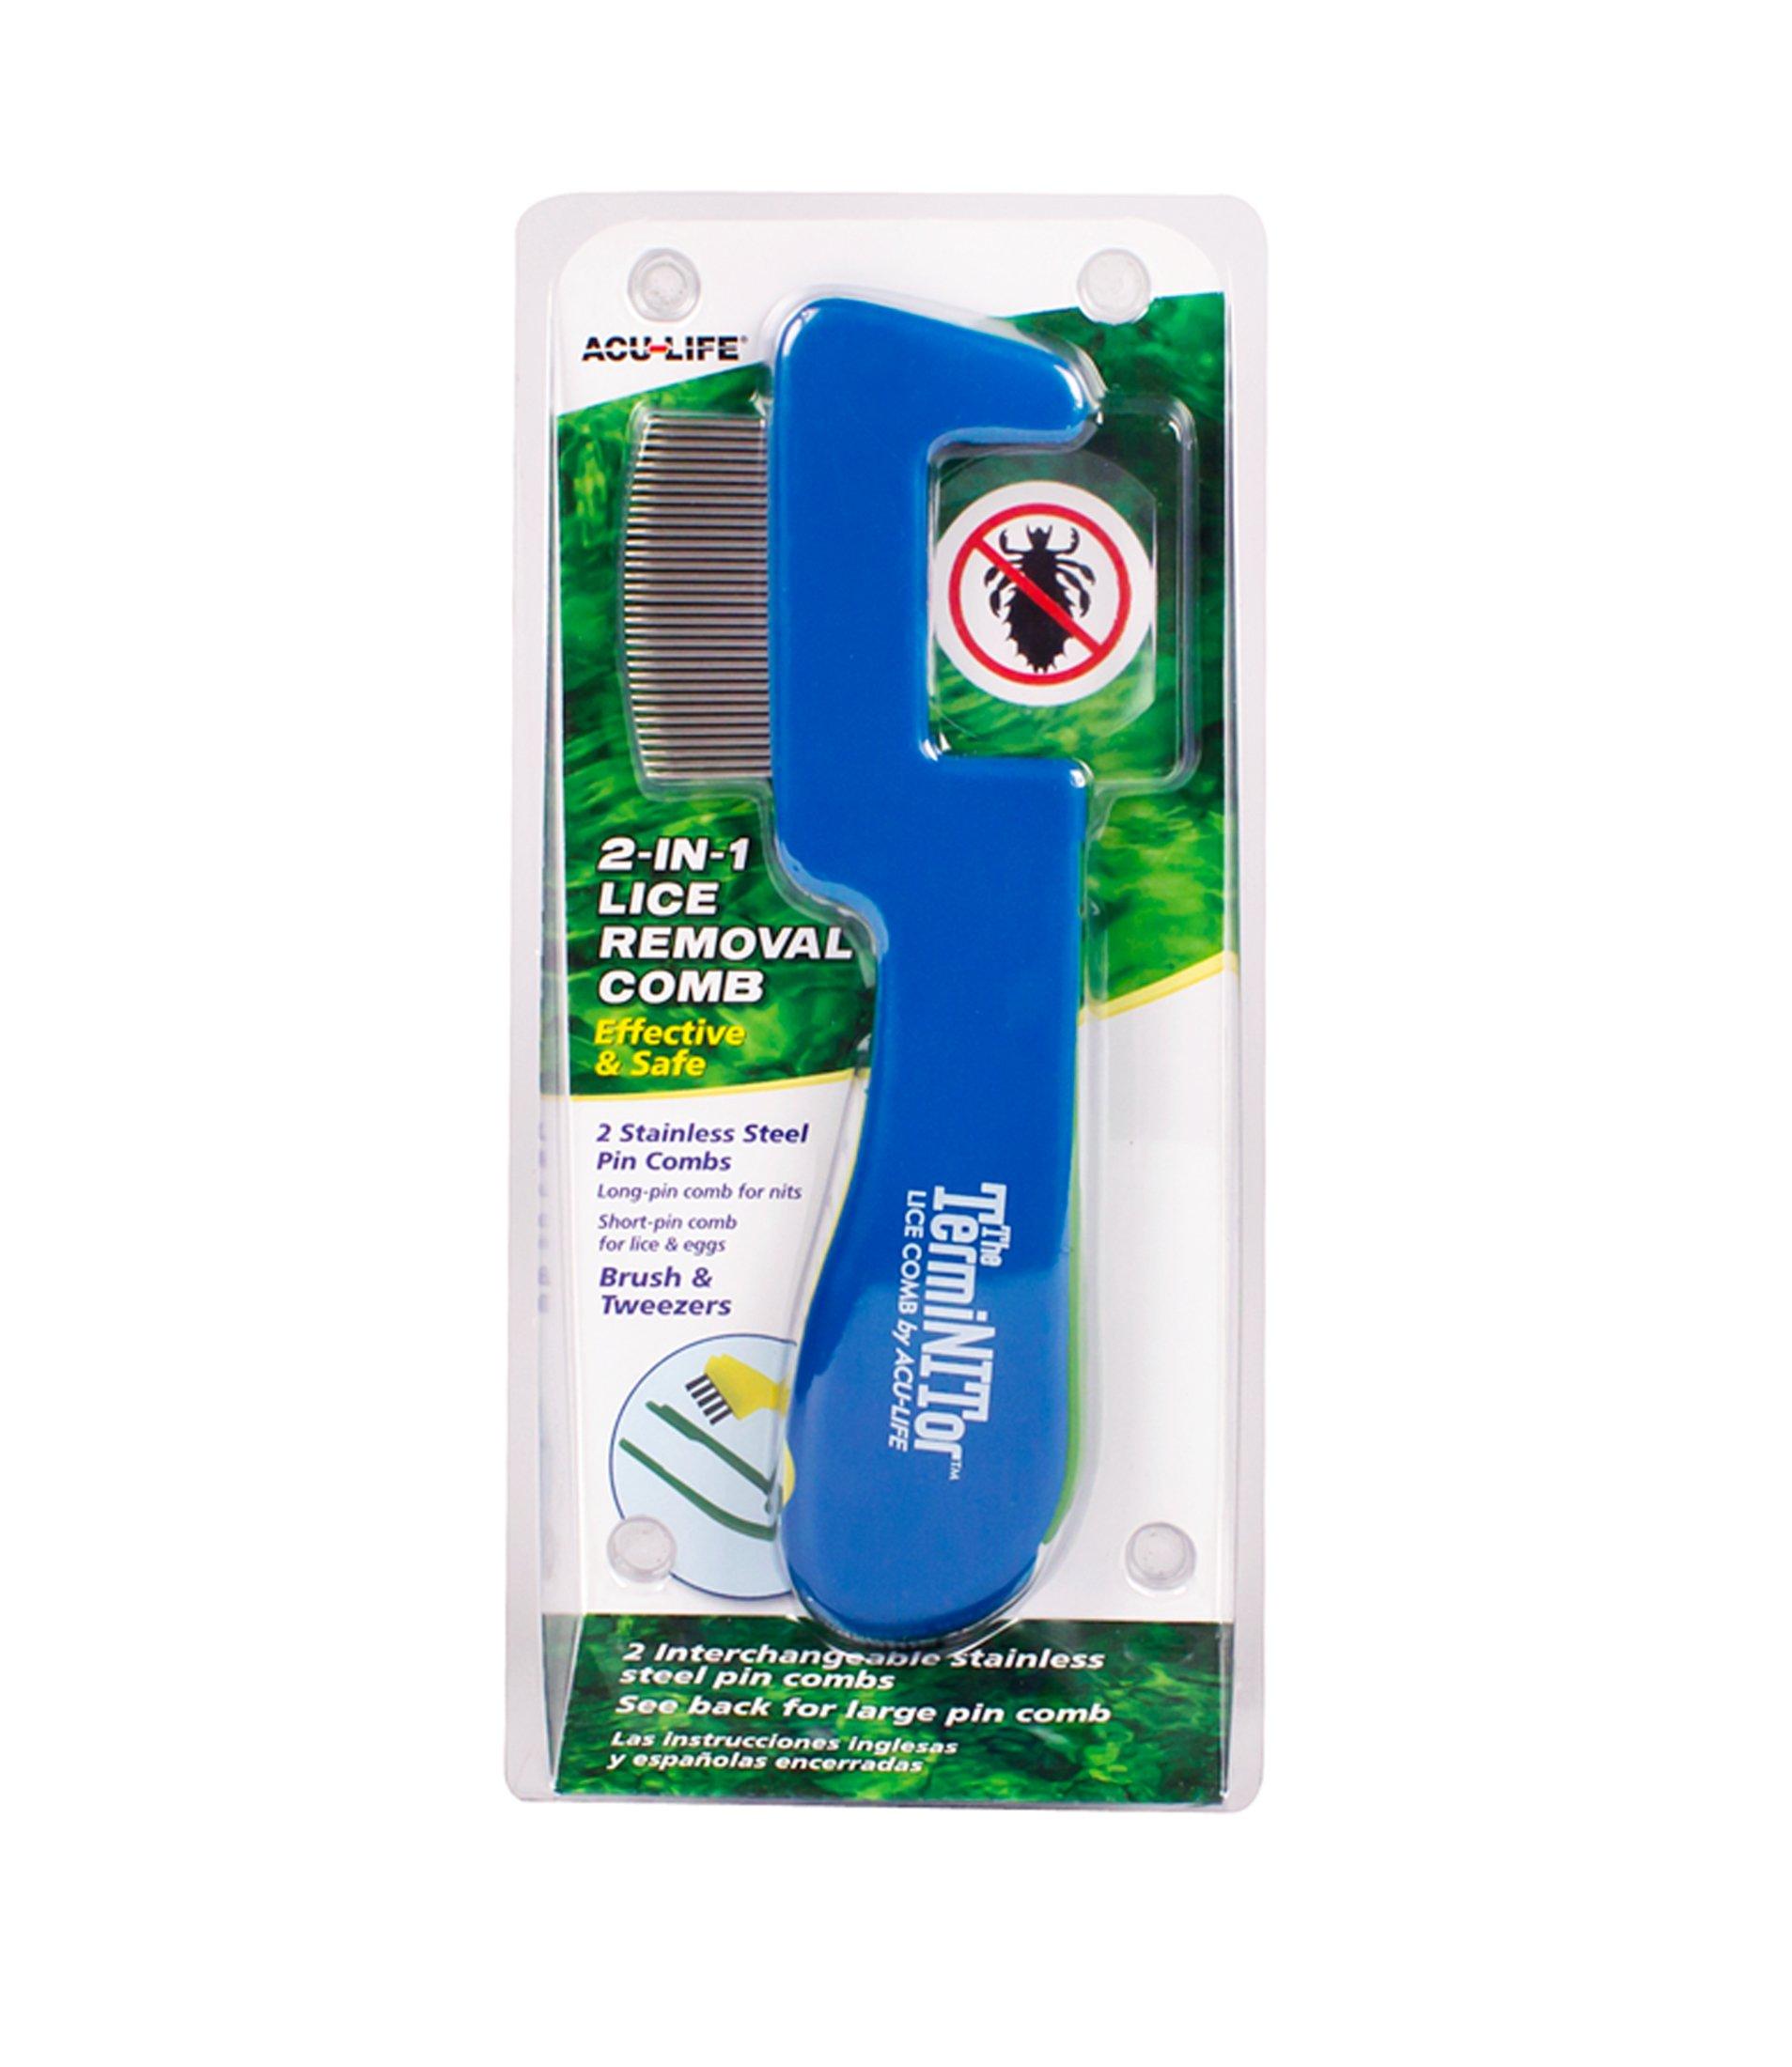 Acu-Life Lice Comb Kit